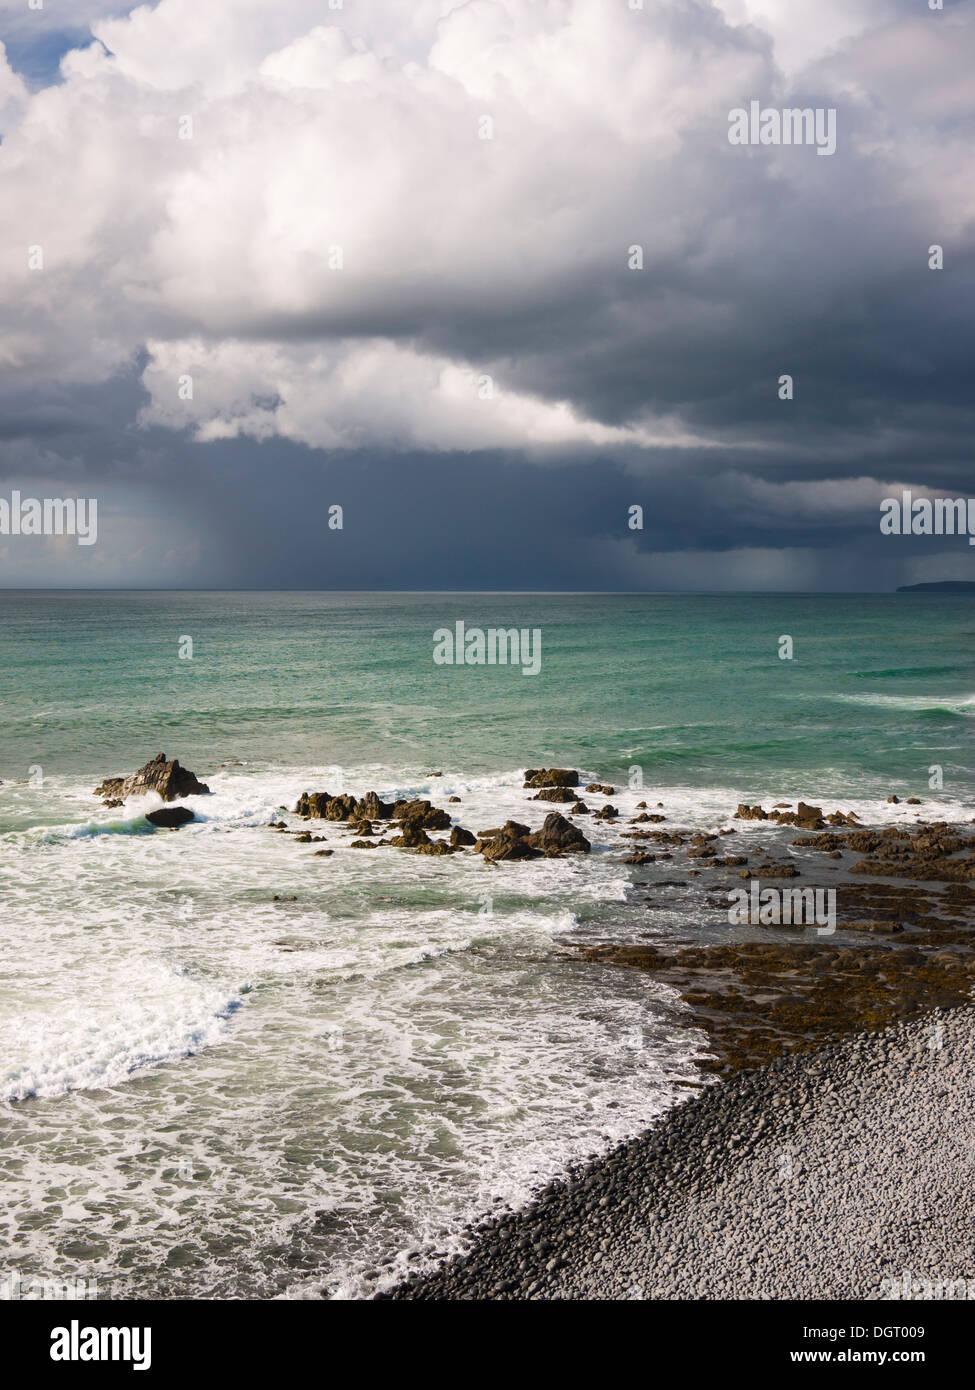 Summer rainstorm over the Atlantic Ocean viewed from Cornborough range on the North Devon coast near Abbotsham, England. - Stock Image